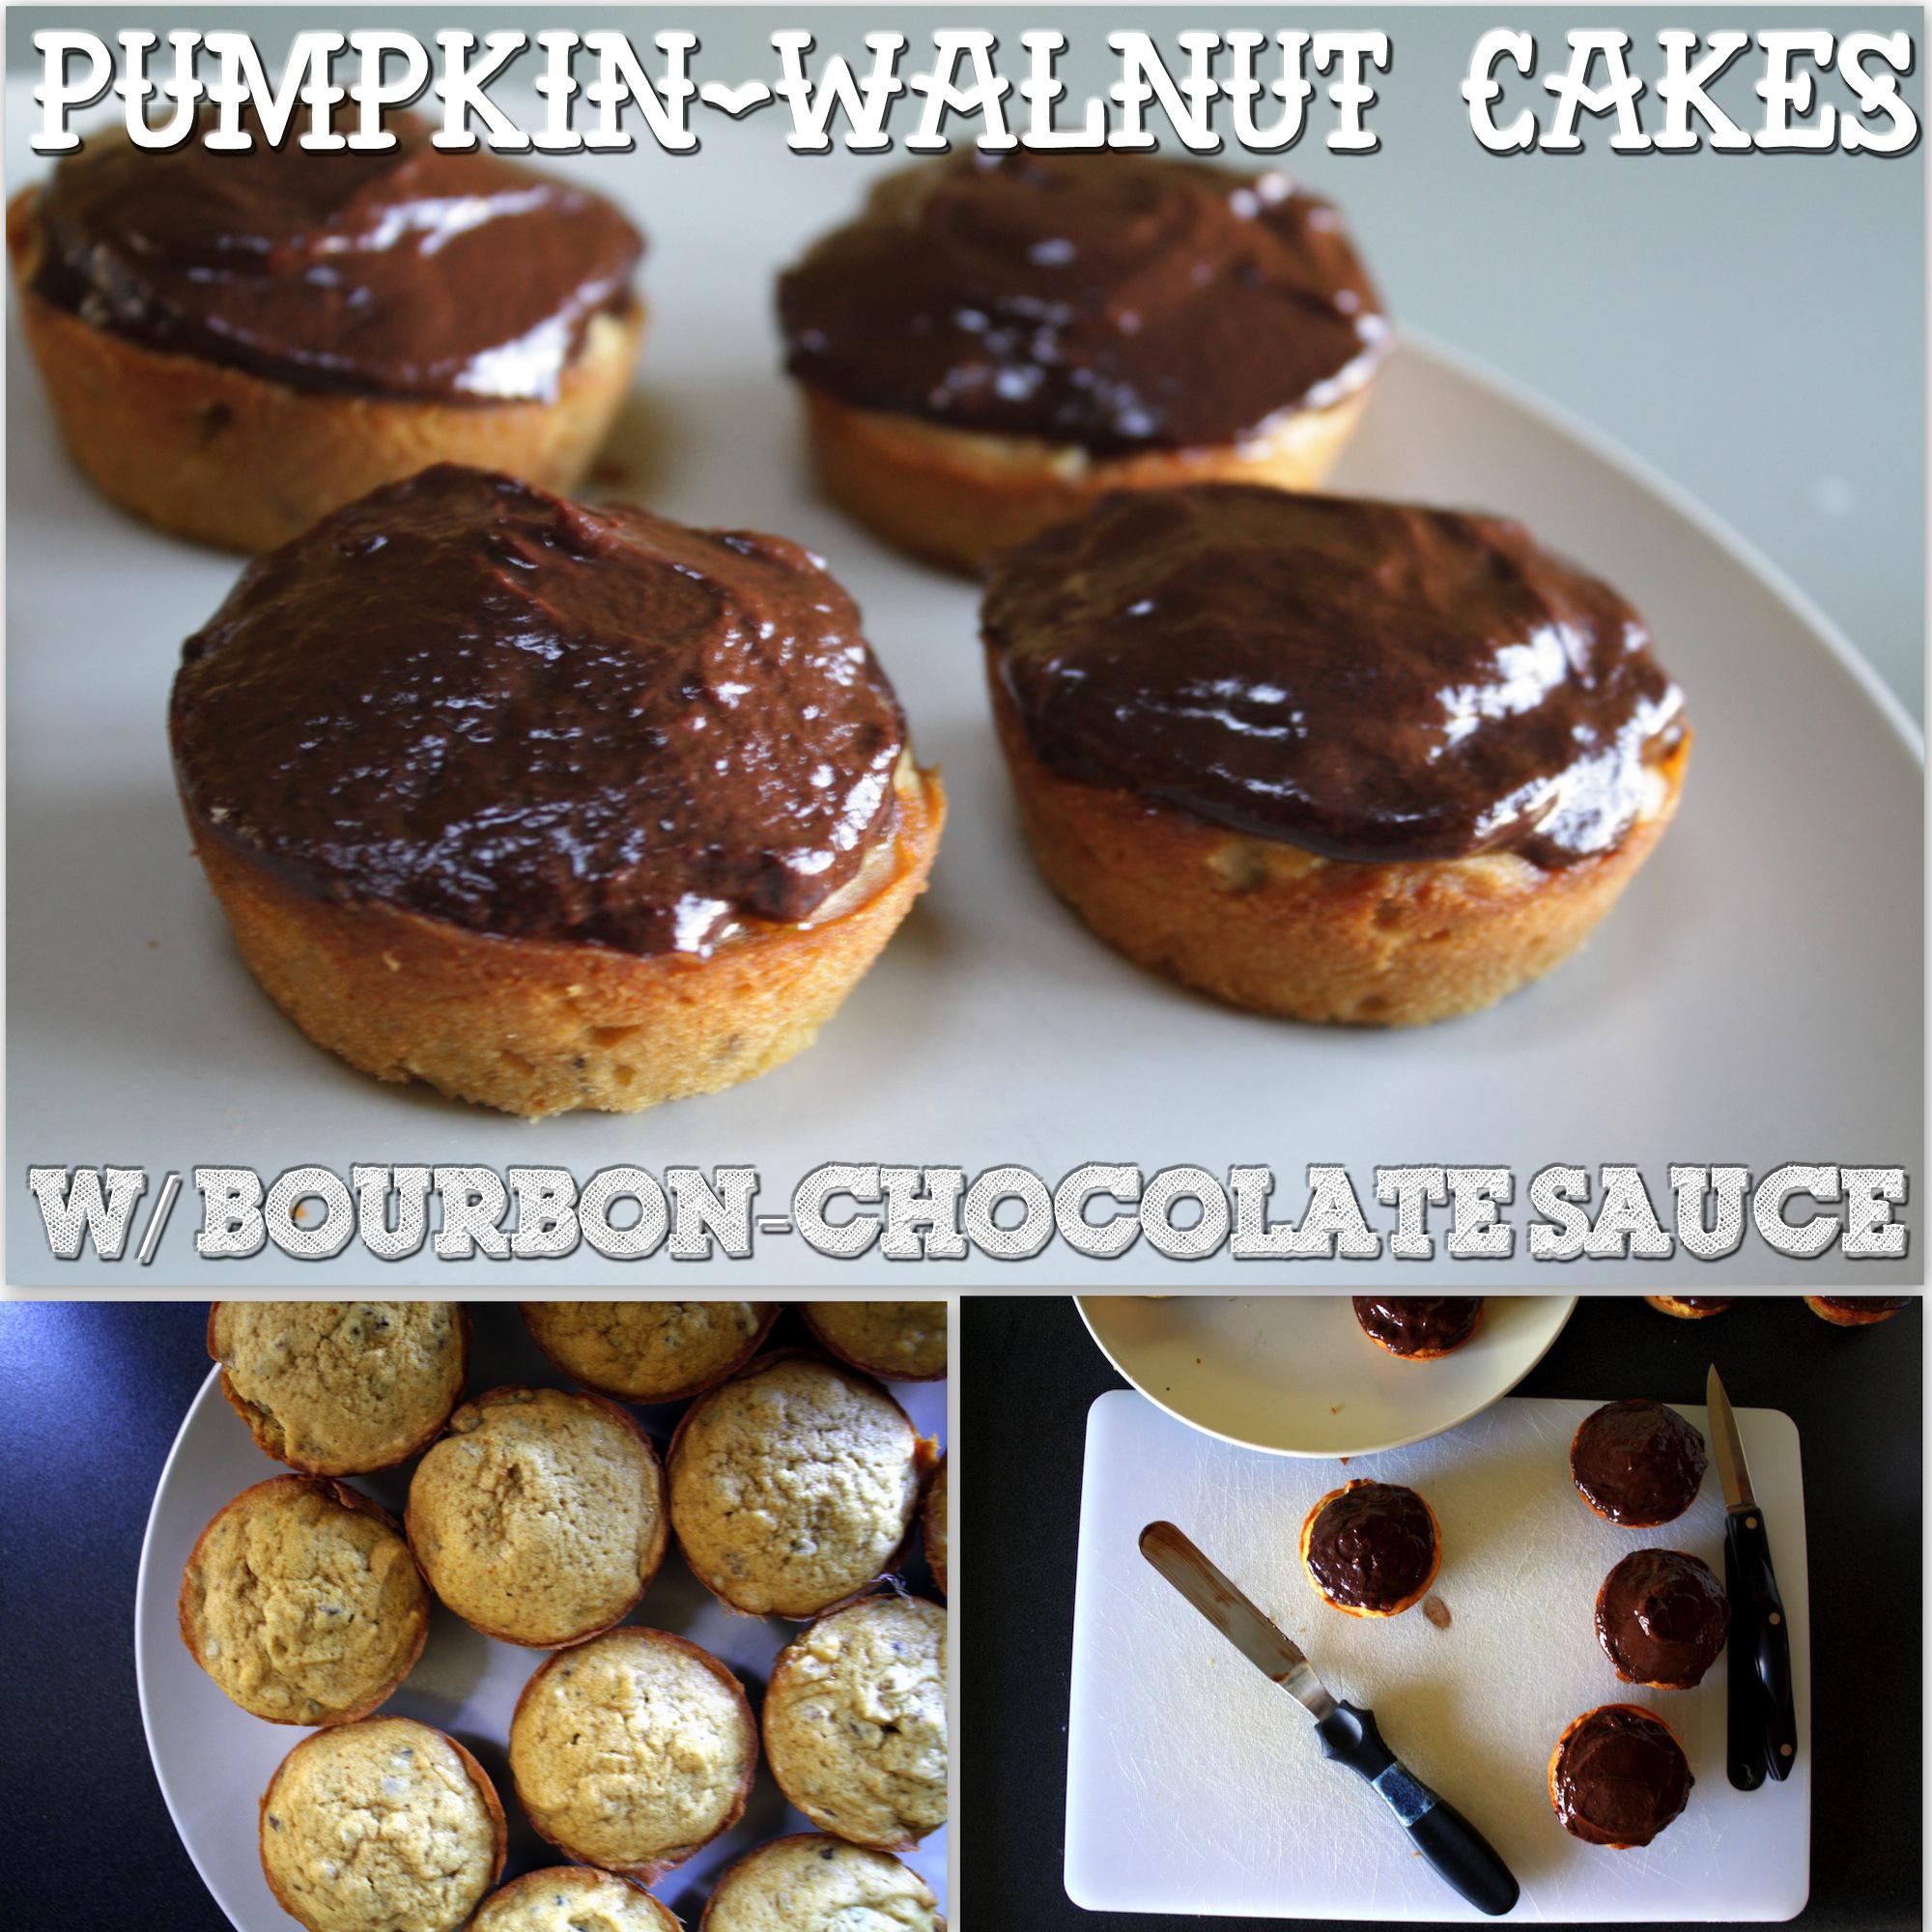 PumpkinCakeBlog